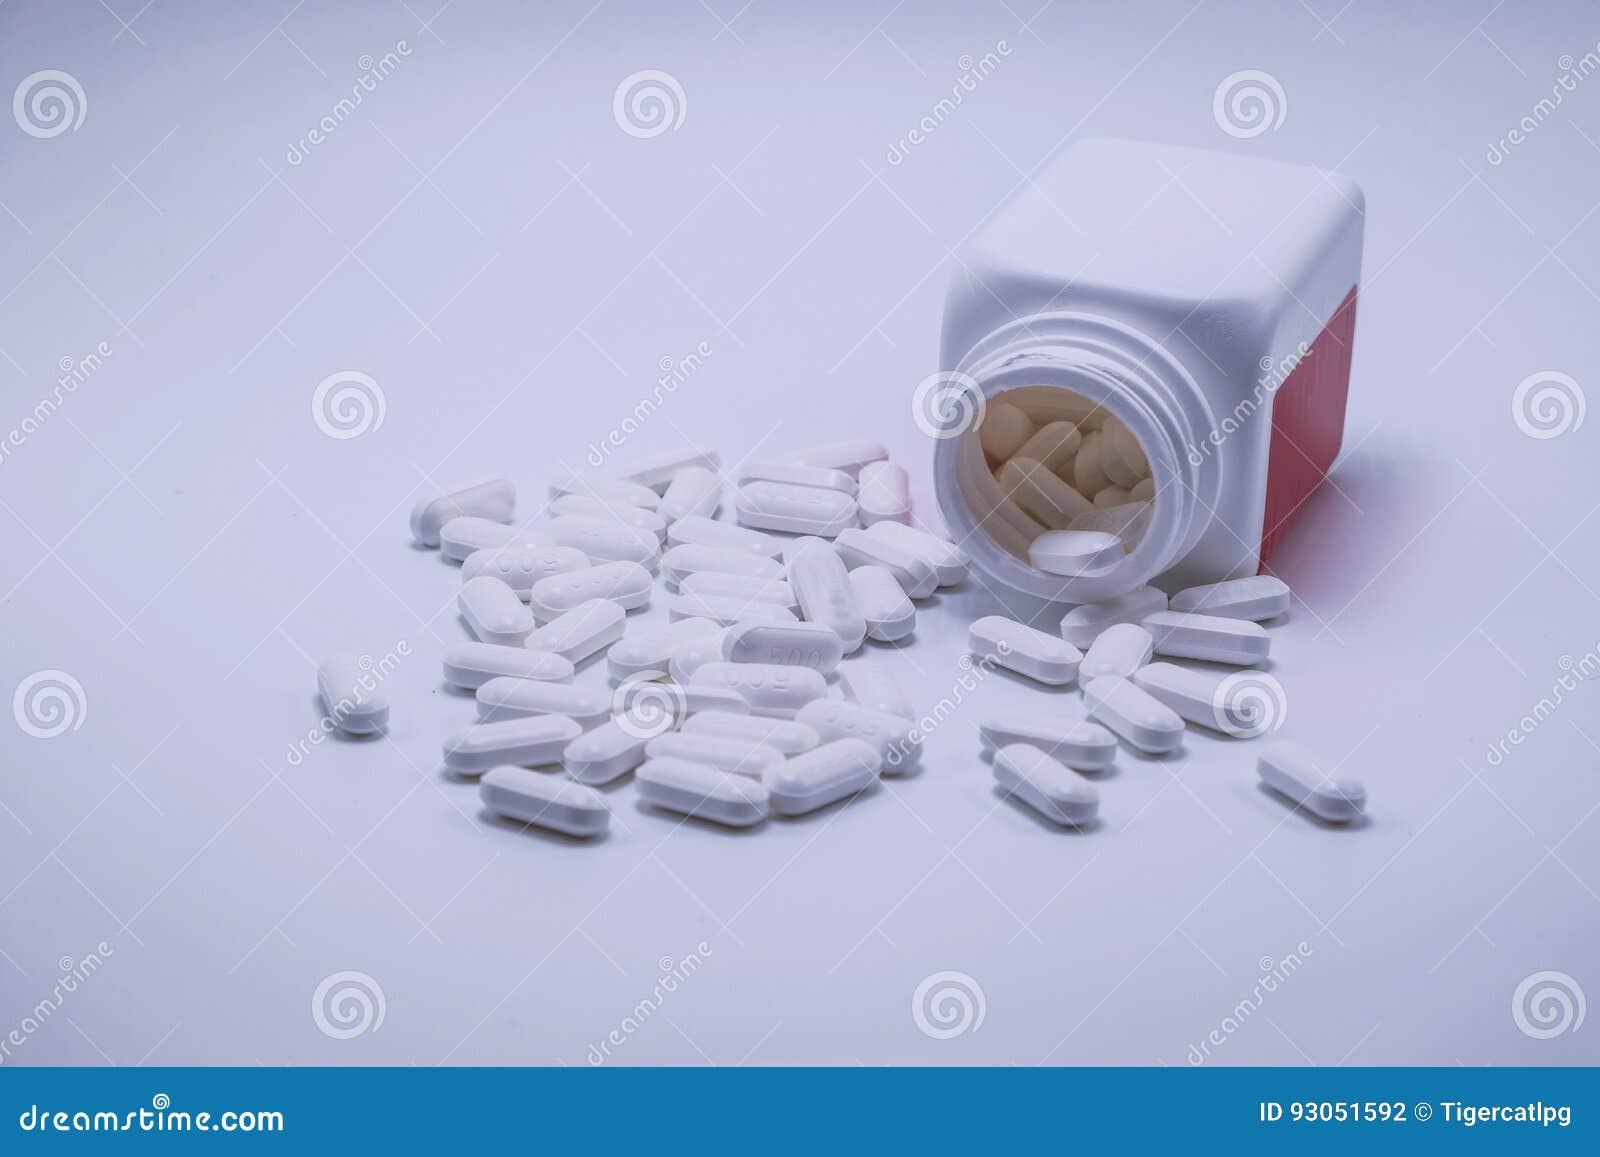 Flaschen Paracetamol